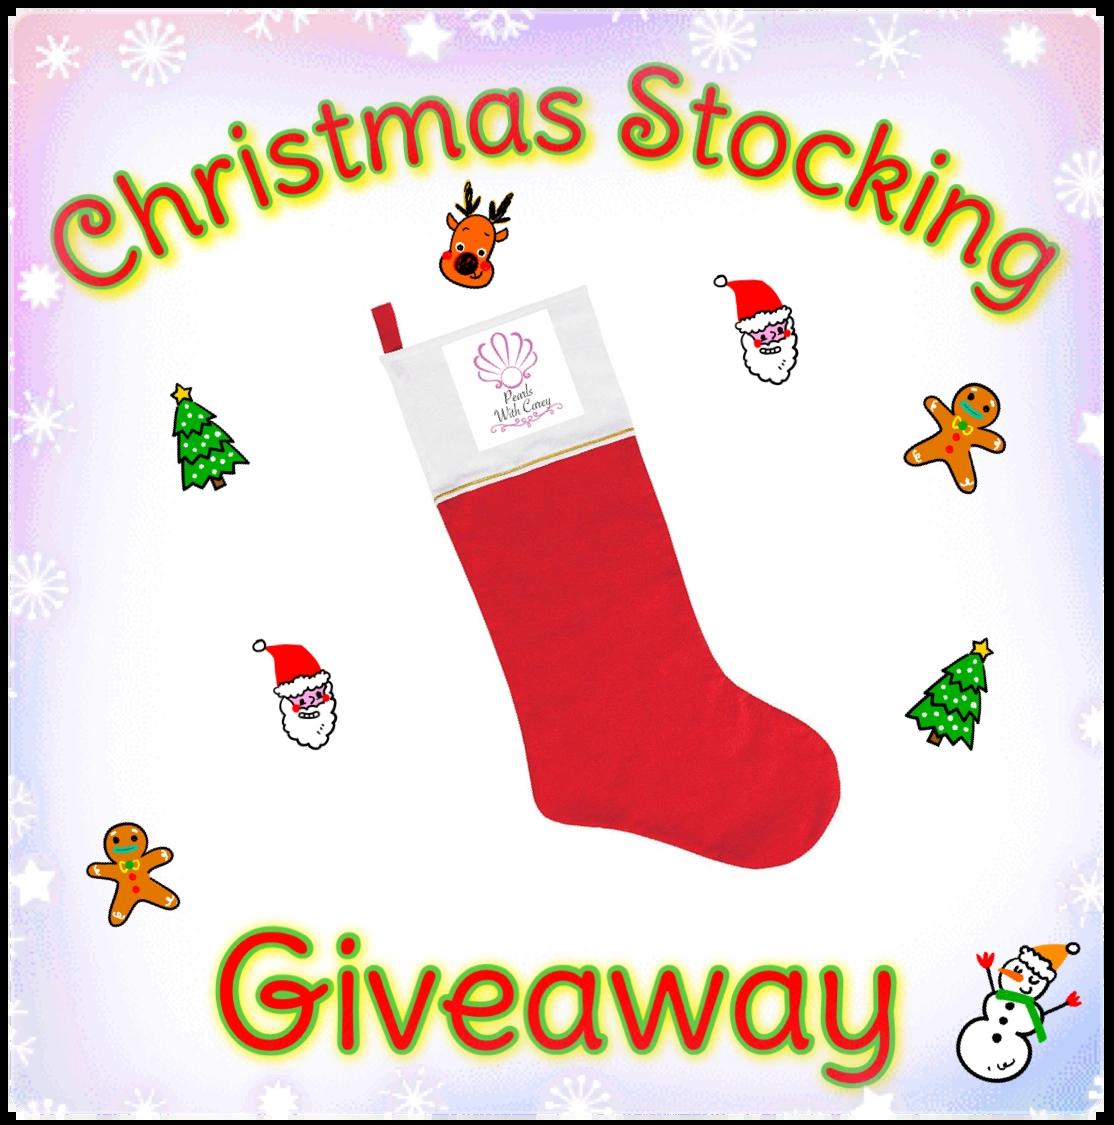 Christmas Giveaway 2020 2020 Christmas Stocking Giveaway